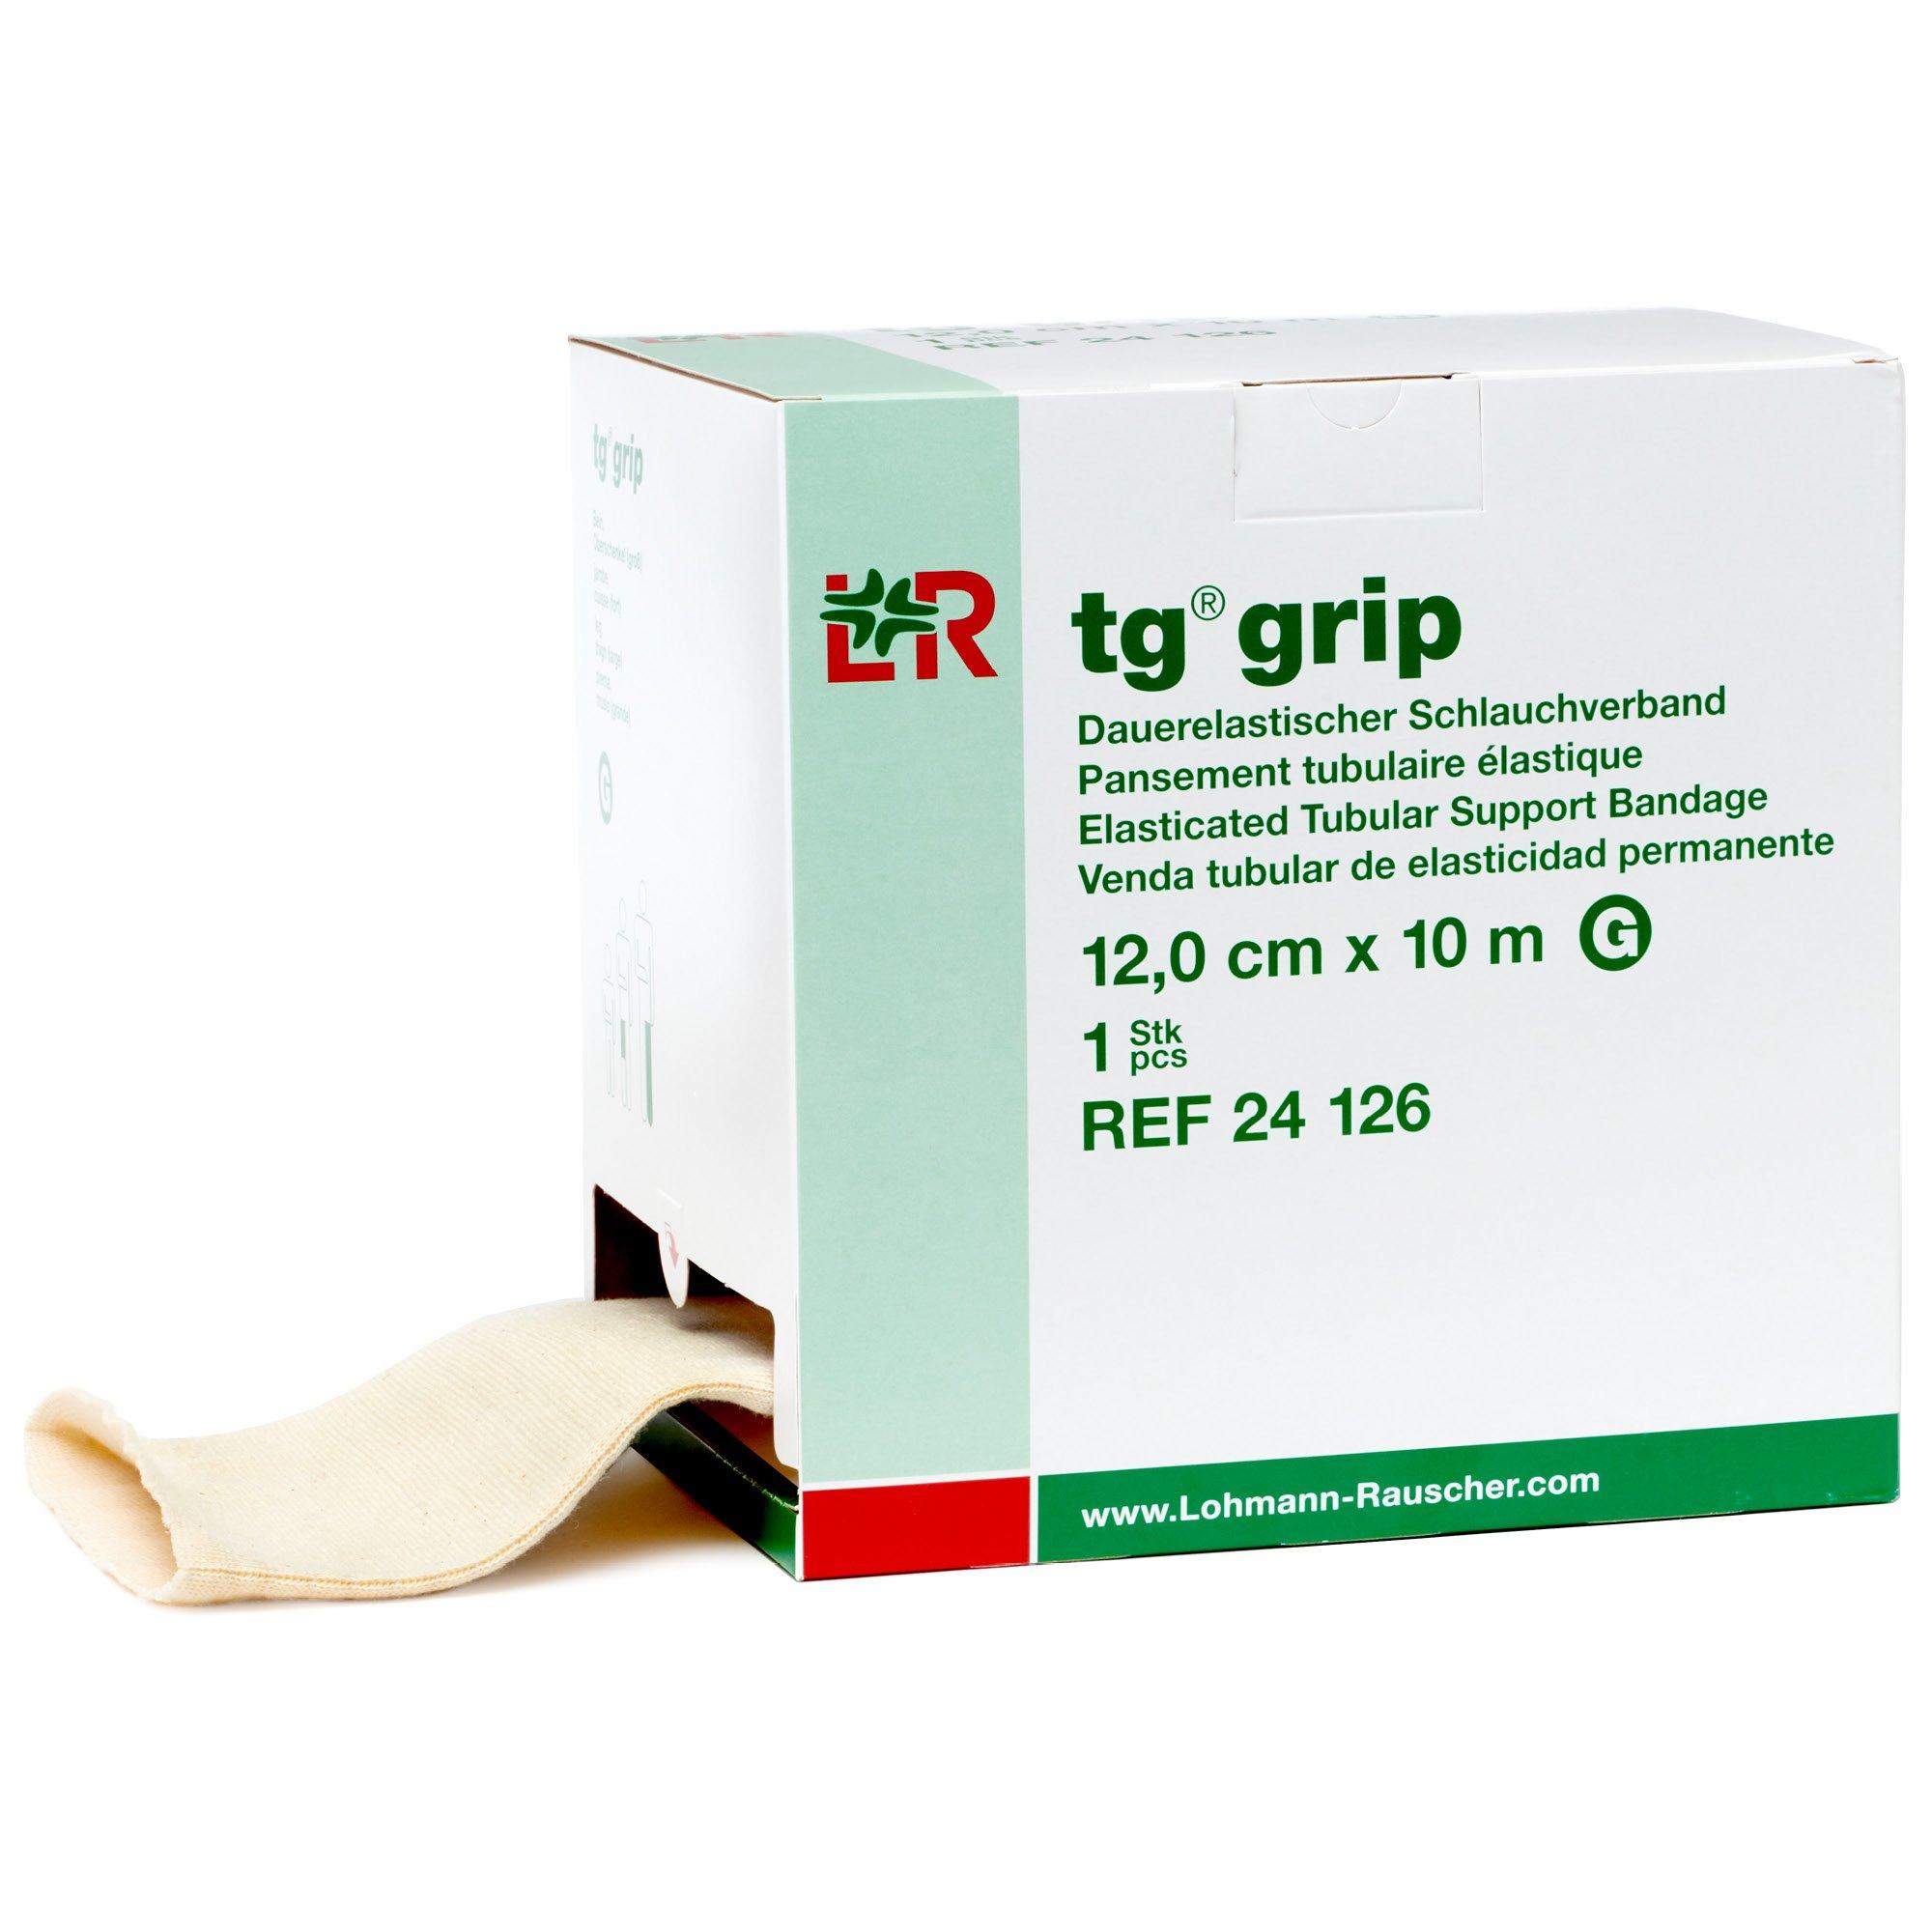 tg Grip Elastic Tubular Compression Bandage, Seamless Tube Stockinette Wrap for Retention, Lymphedema, Swelling, 85% Cotton, Washable & Reusable, Size G